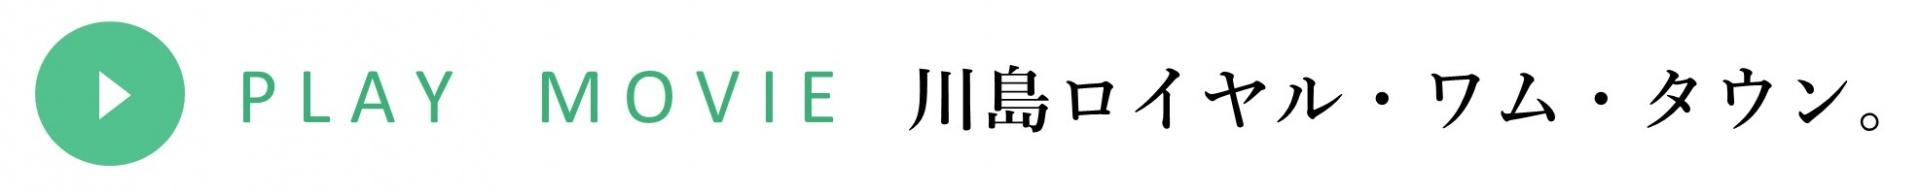 PLAY MOVIE 川島ロイヤル・ワム・タウン。